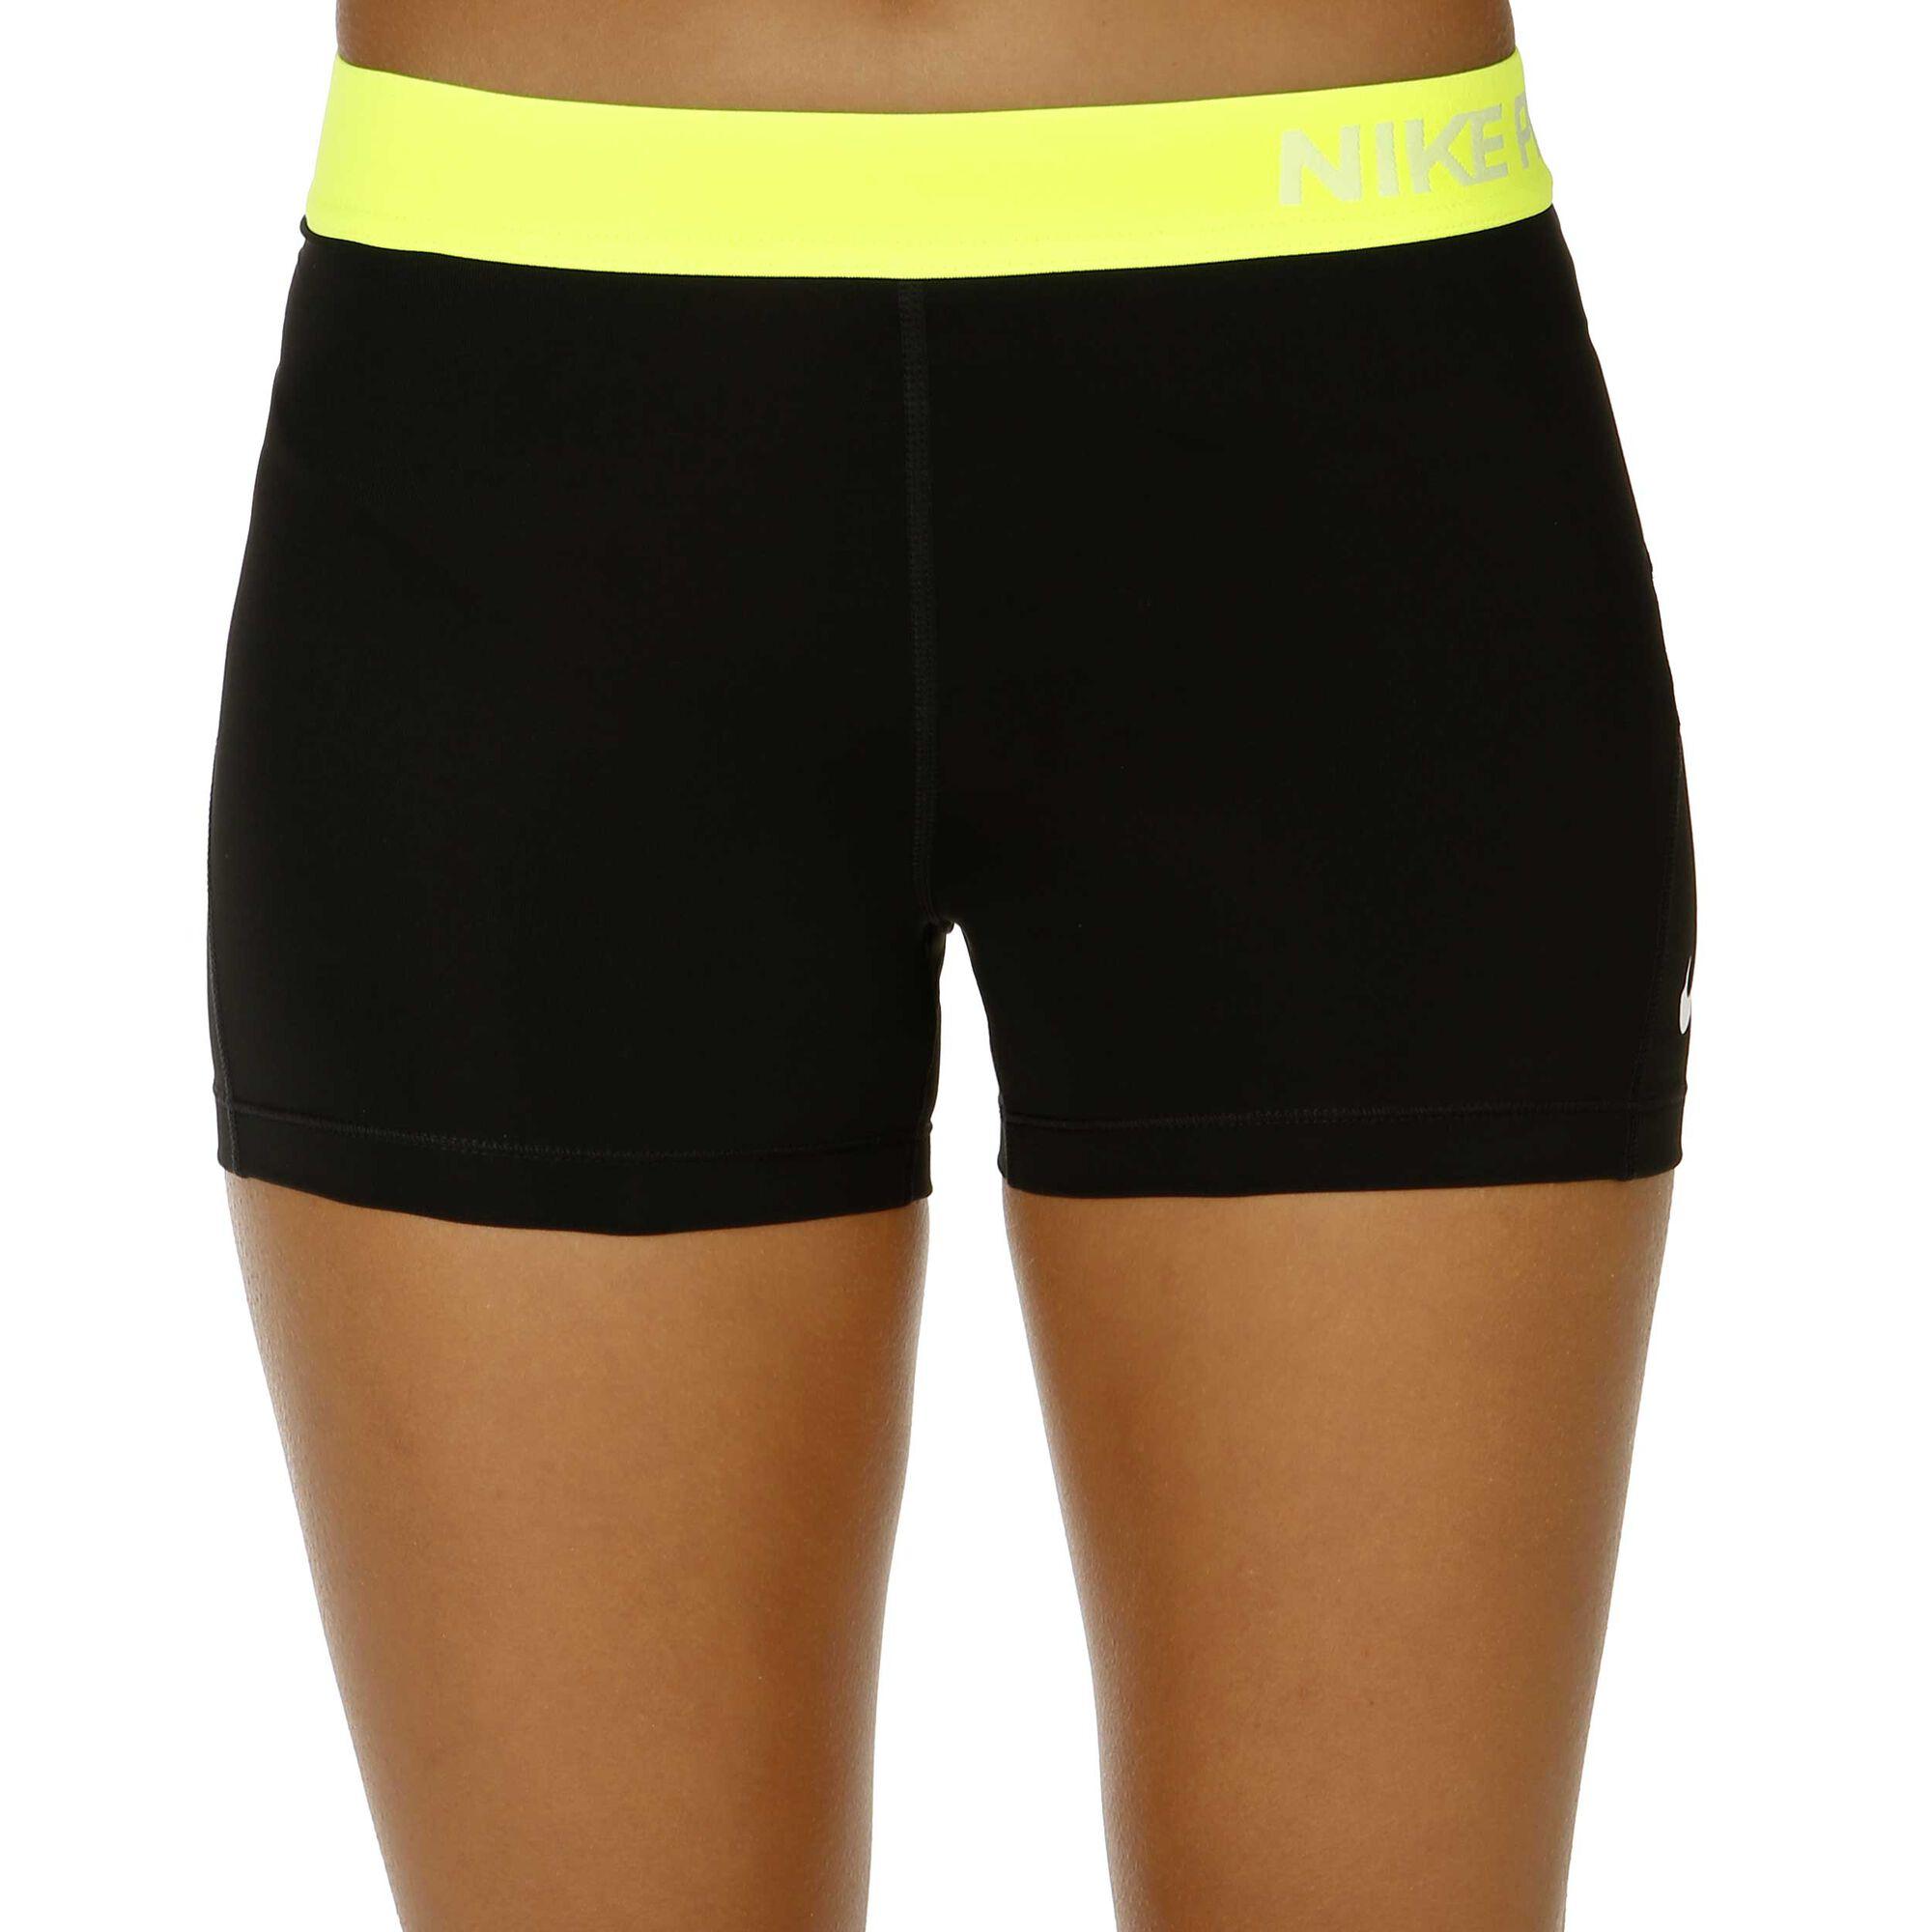 nike pro dry fit 3 shorts damen schwarz neongelb. Black Bedroom Furniture Sets. Home Design Ideas